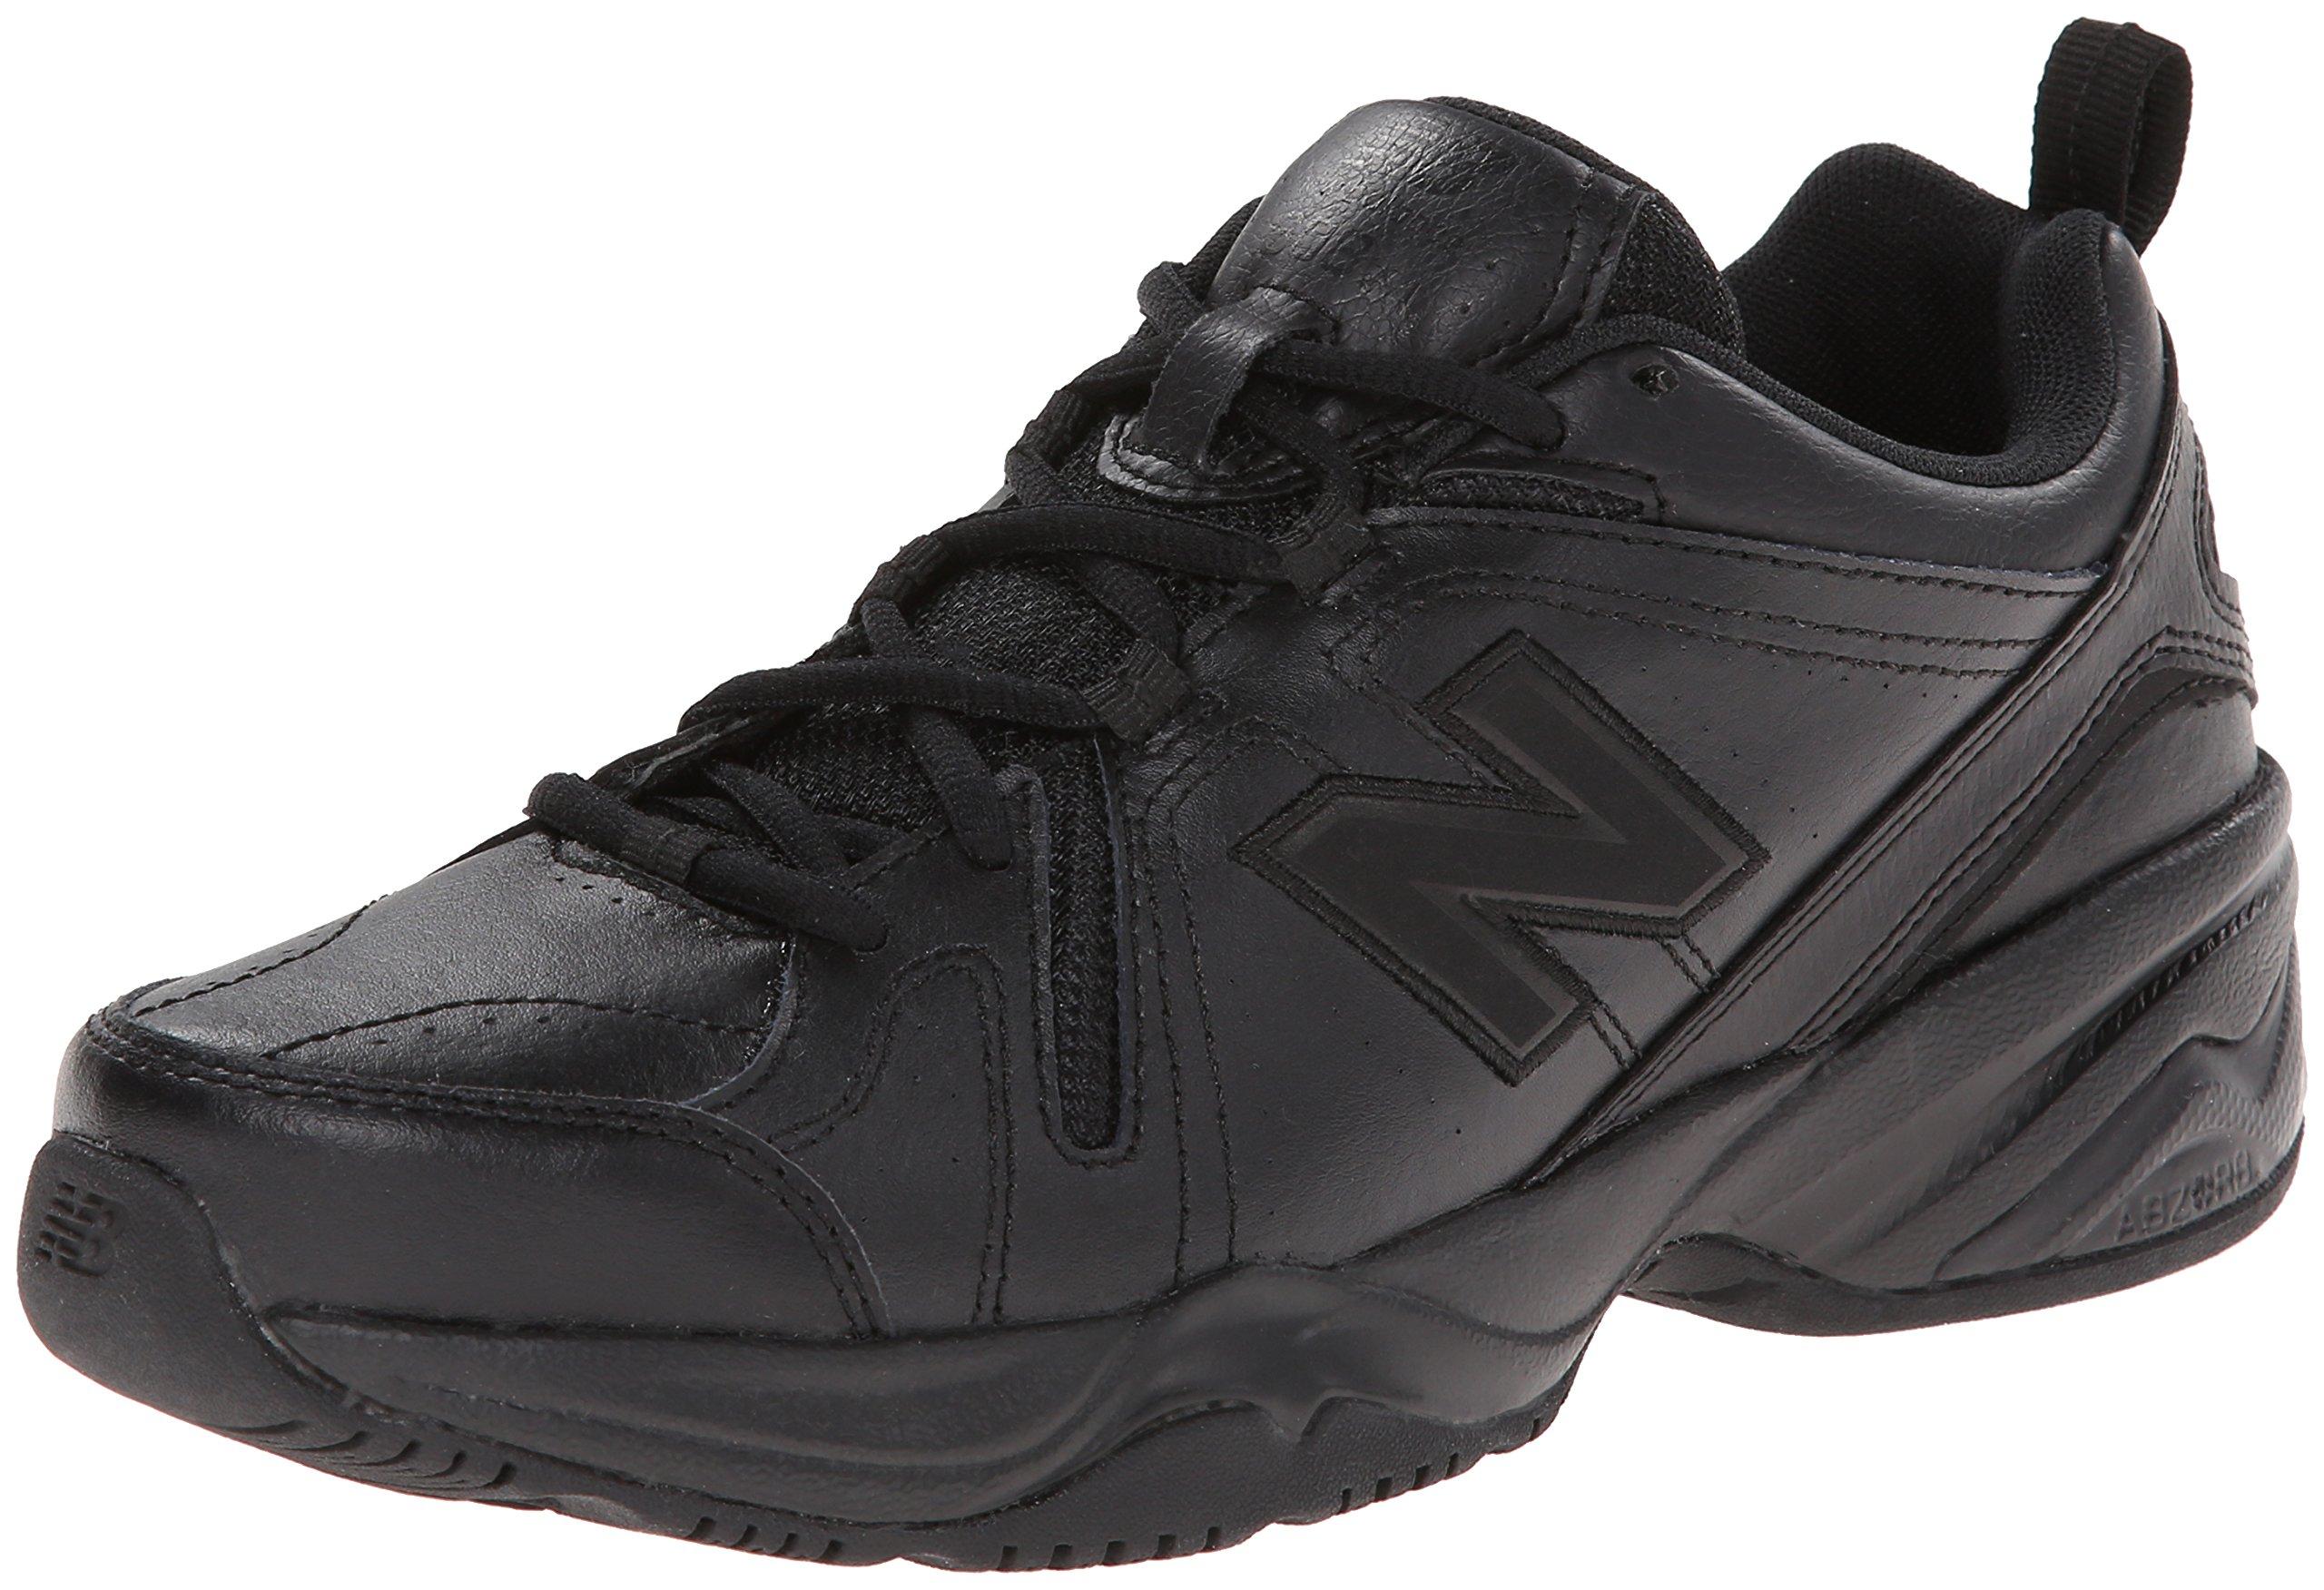 New Balance Women's WX608v4 Training Shoe, Black, 8 D US